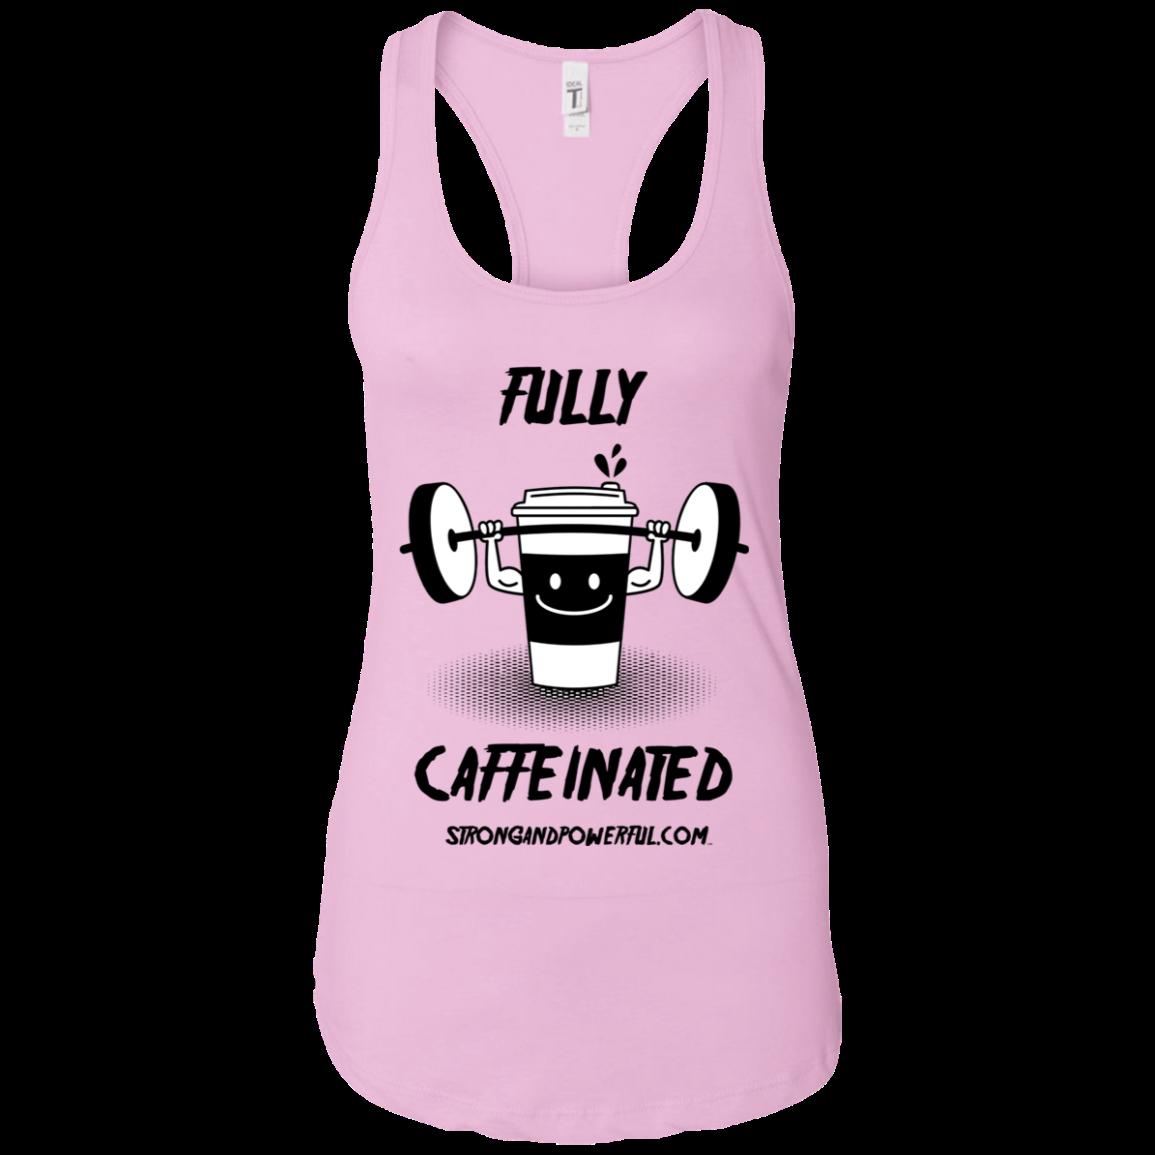 Fully Caffeinated Tank